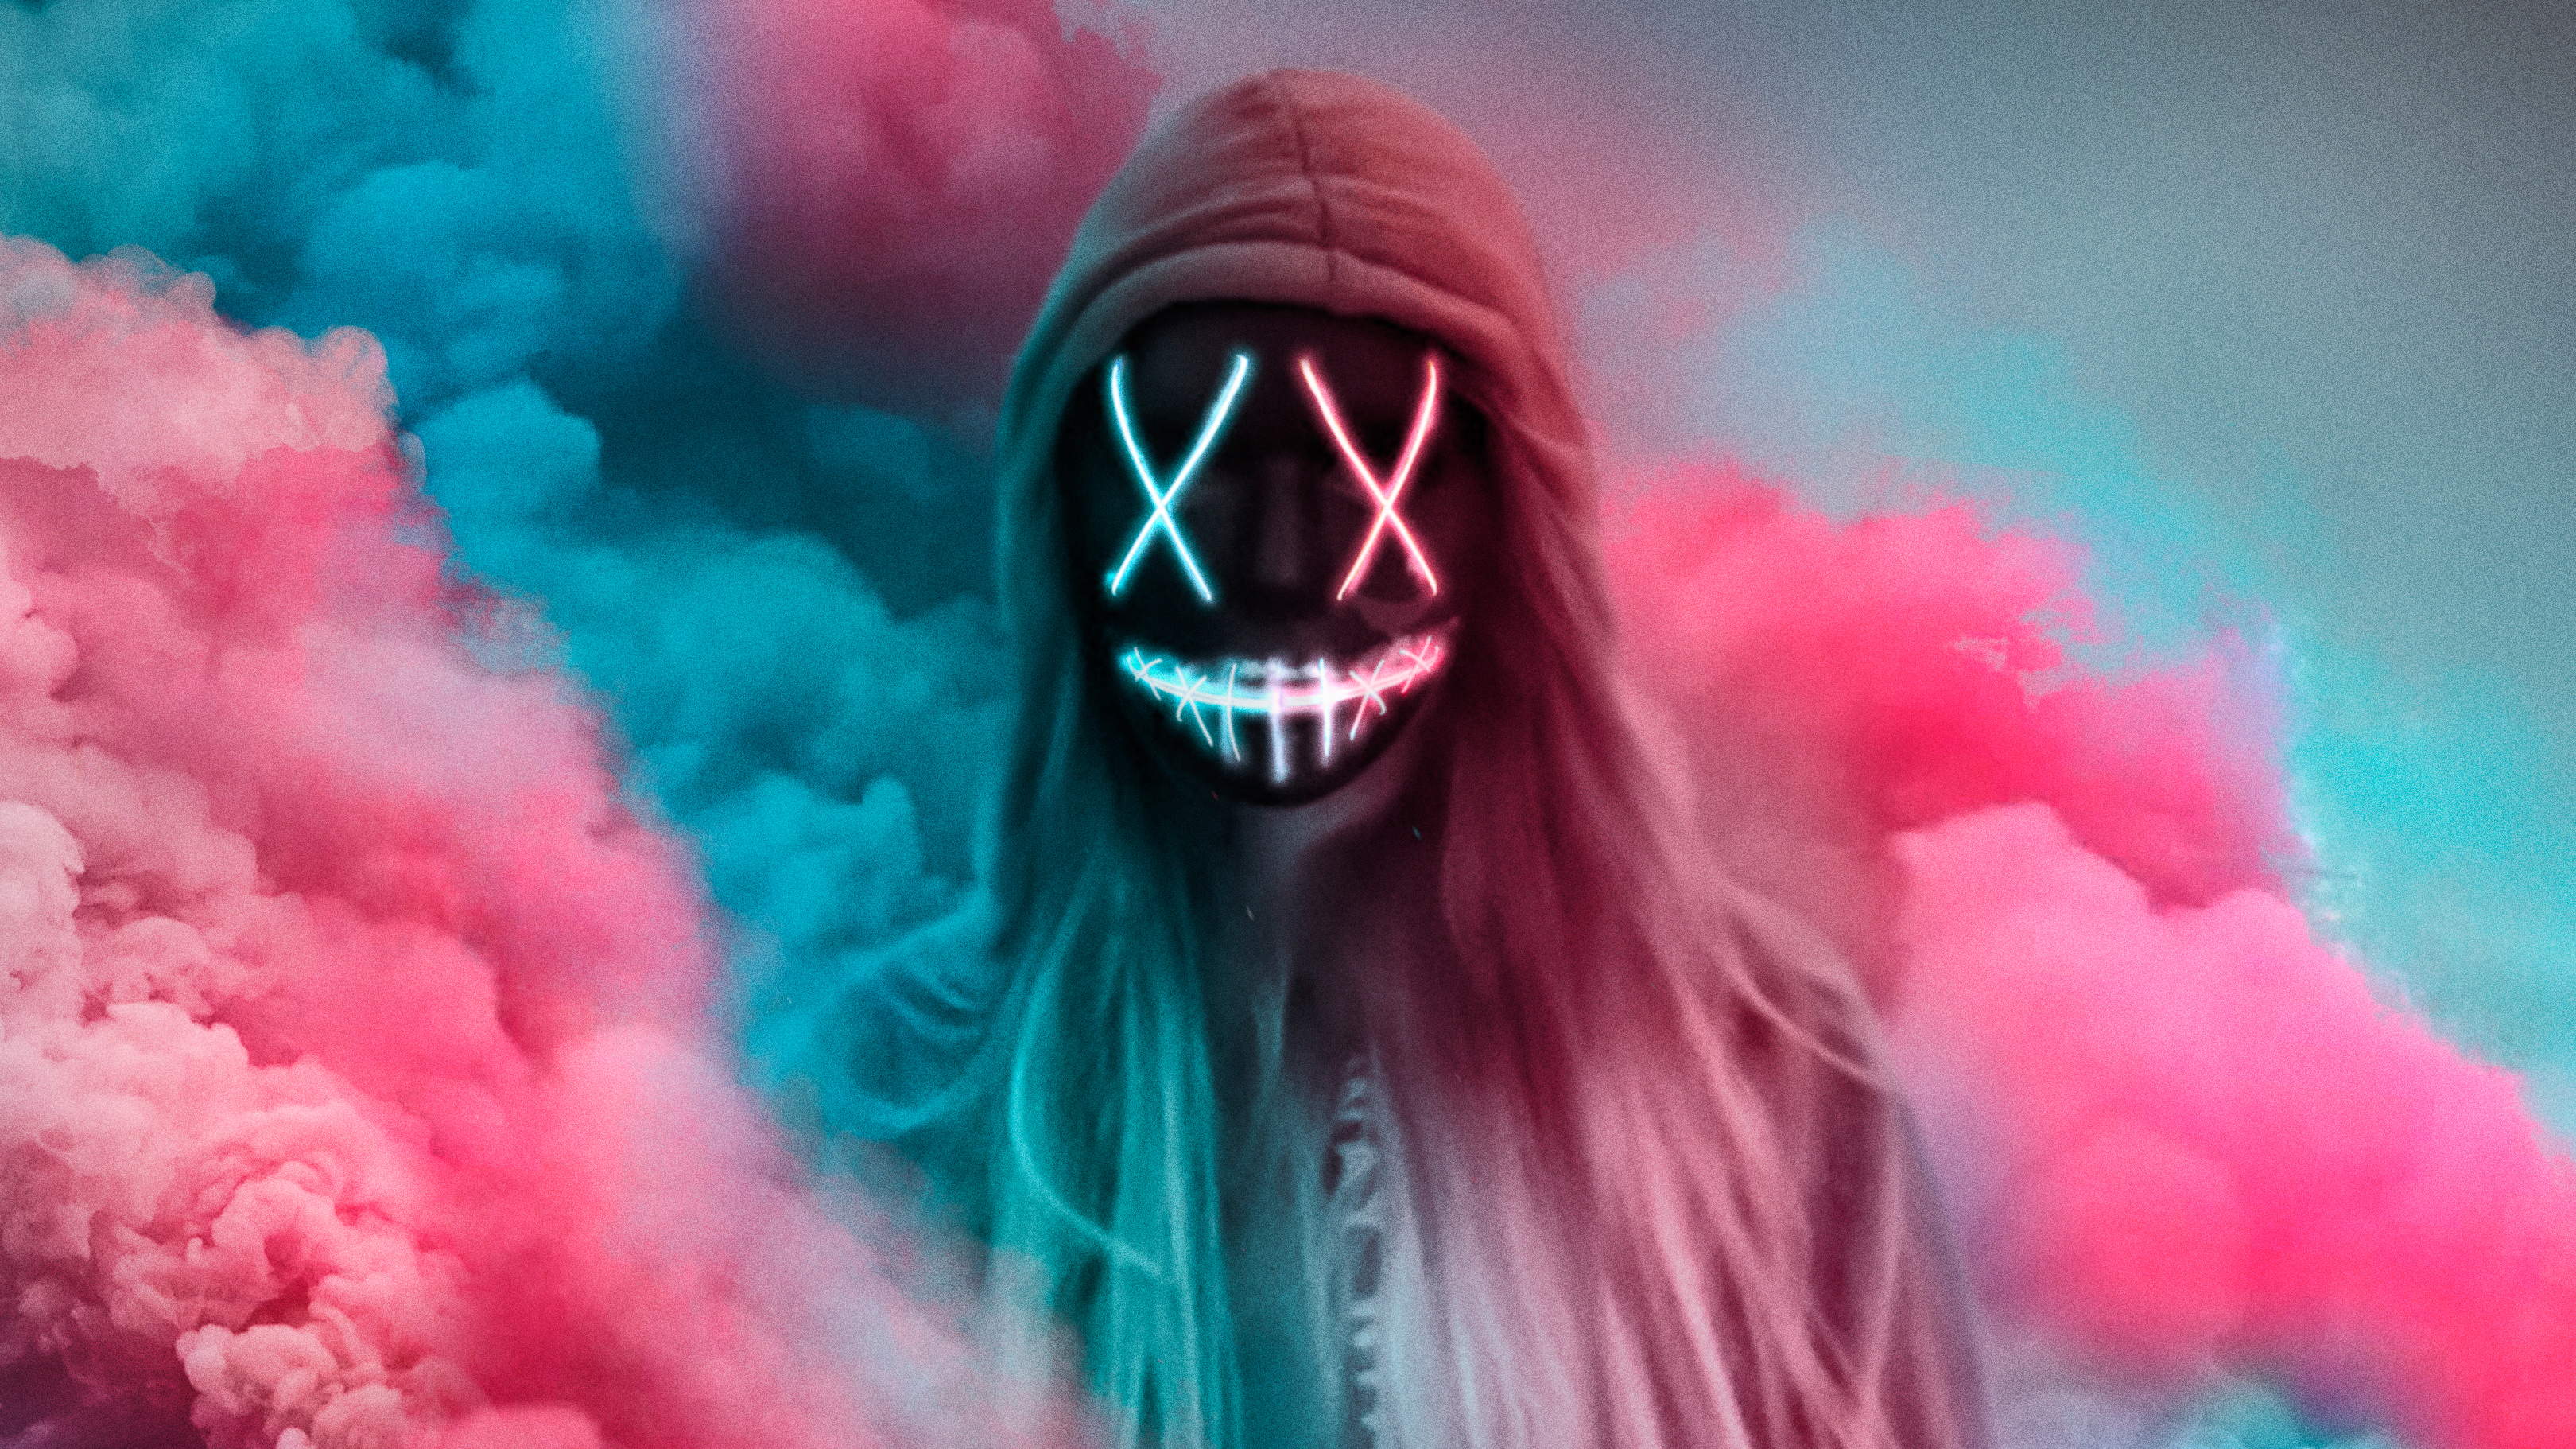 1336x768 Neon Mask Girl Colorful Gas Laptop Hd Hd 4k